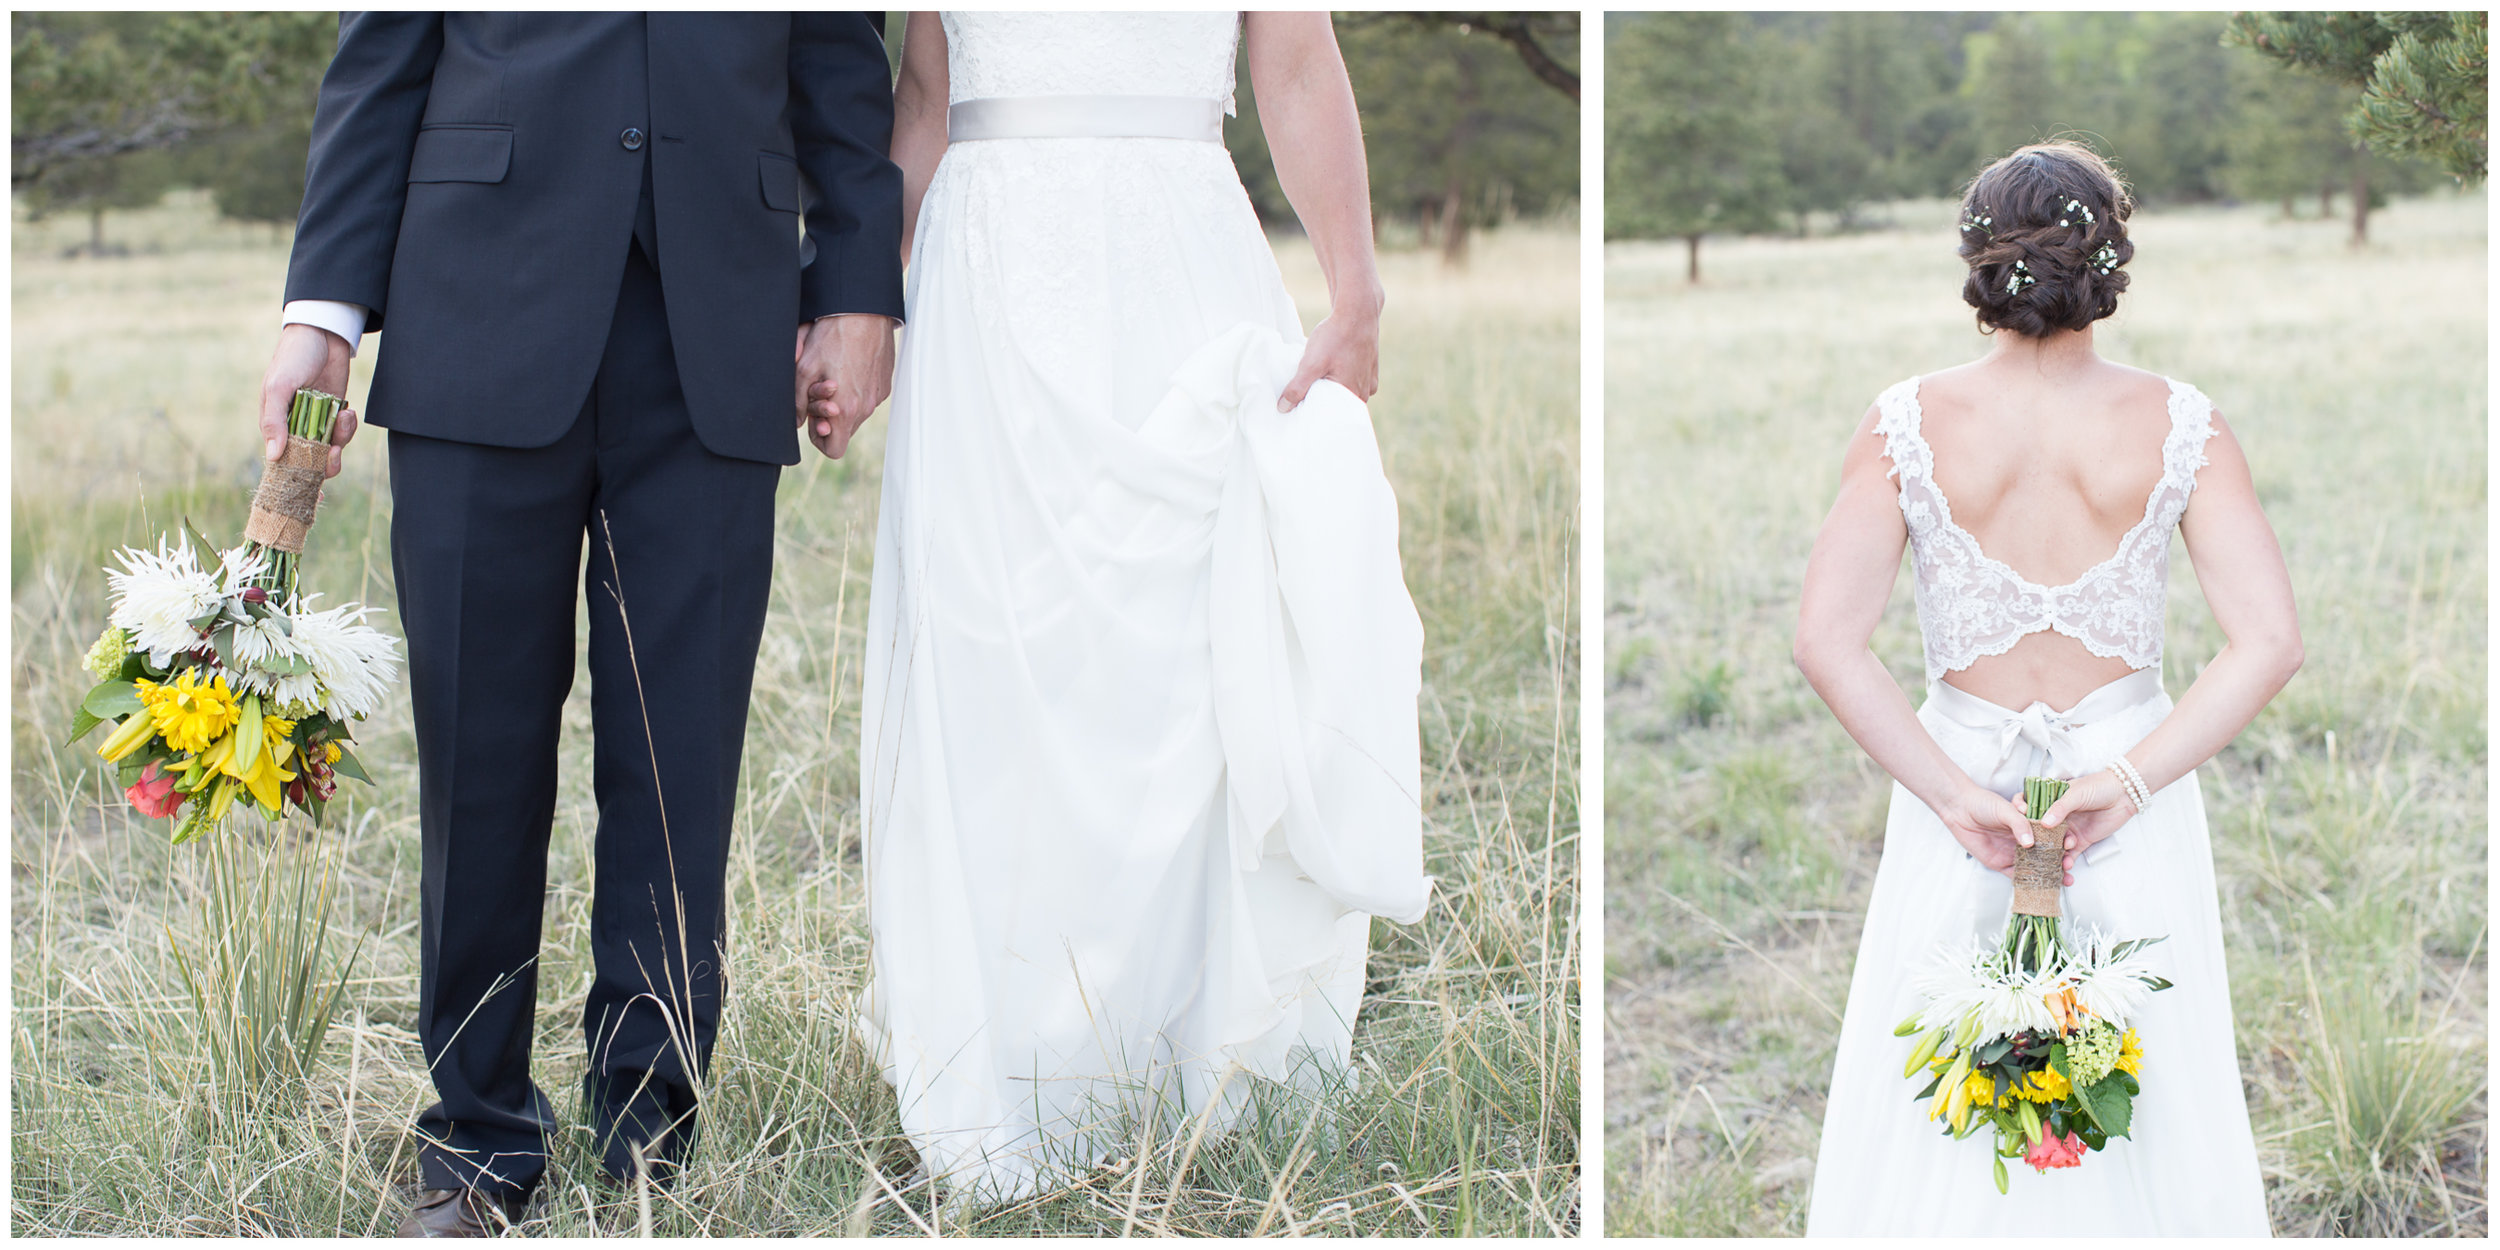 Thompson Wedding 17.jpg